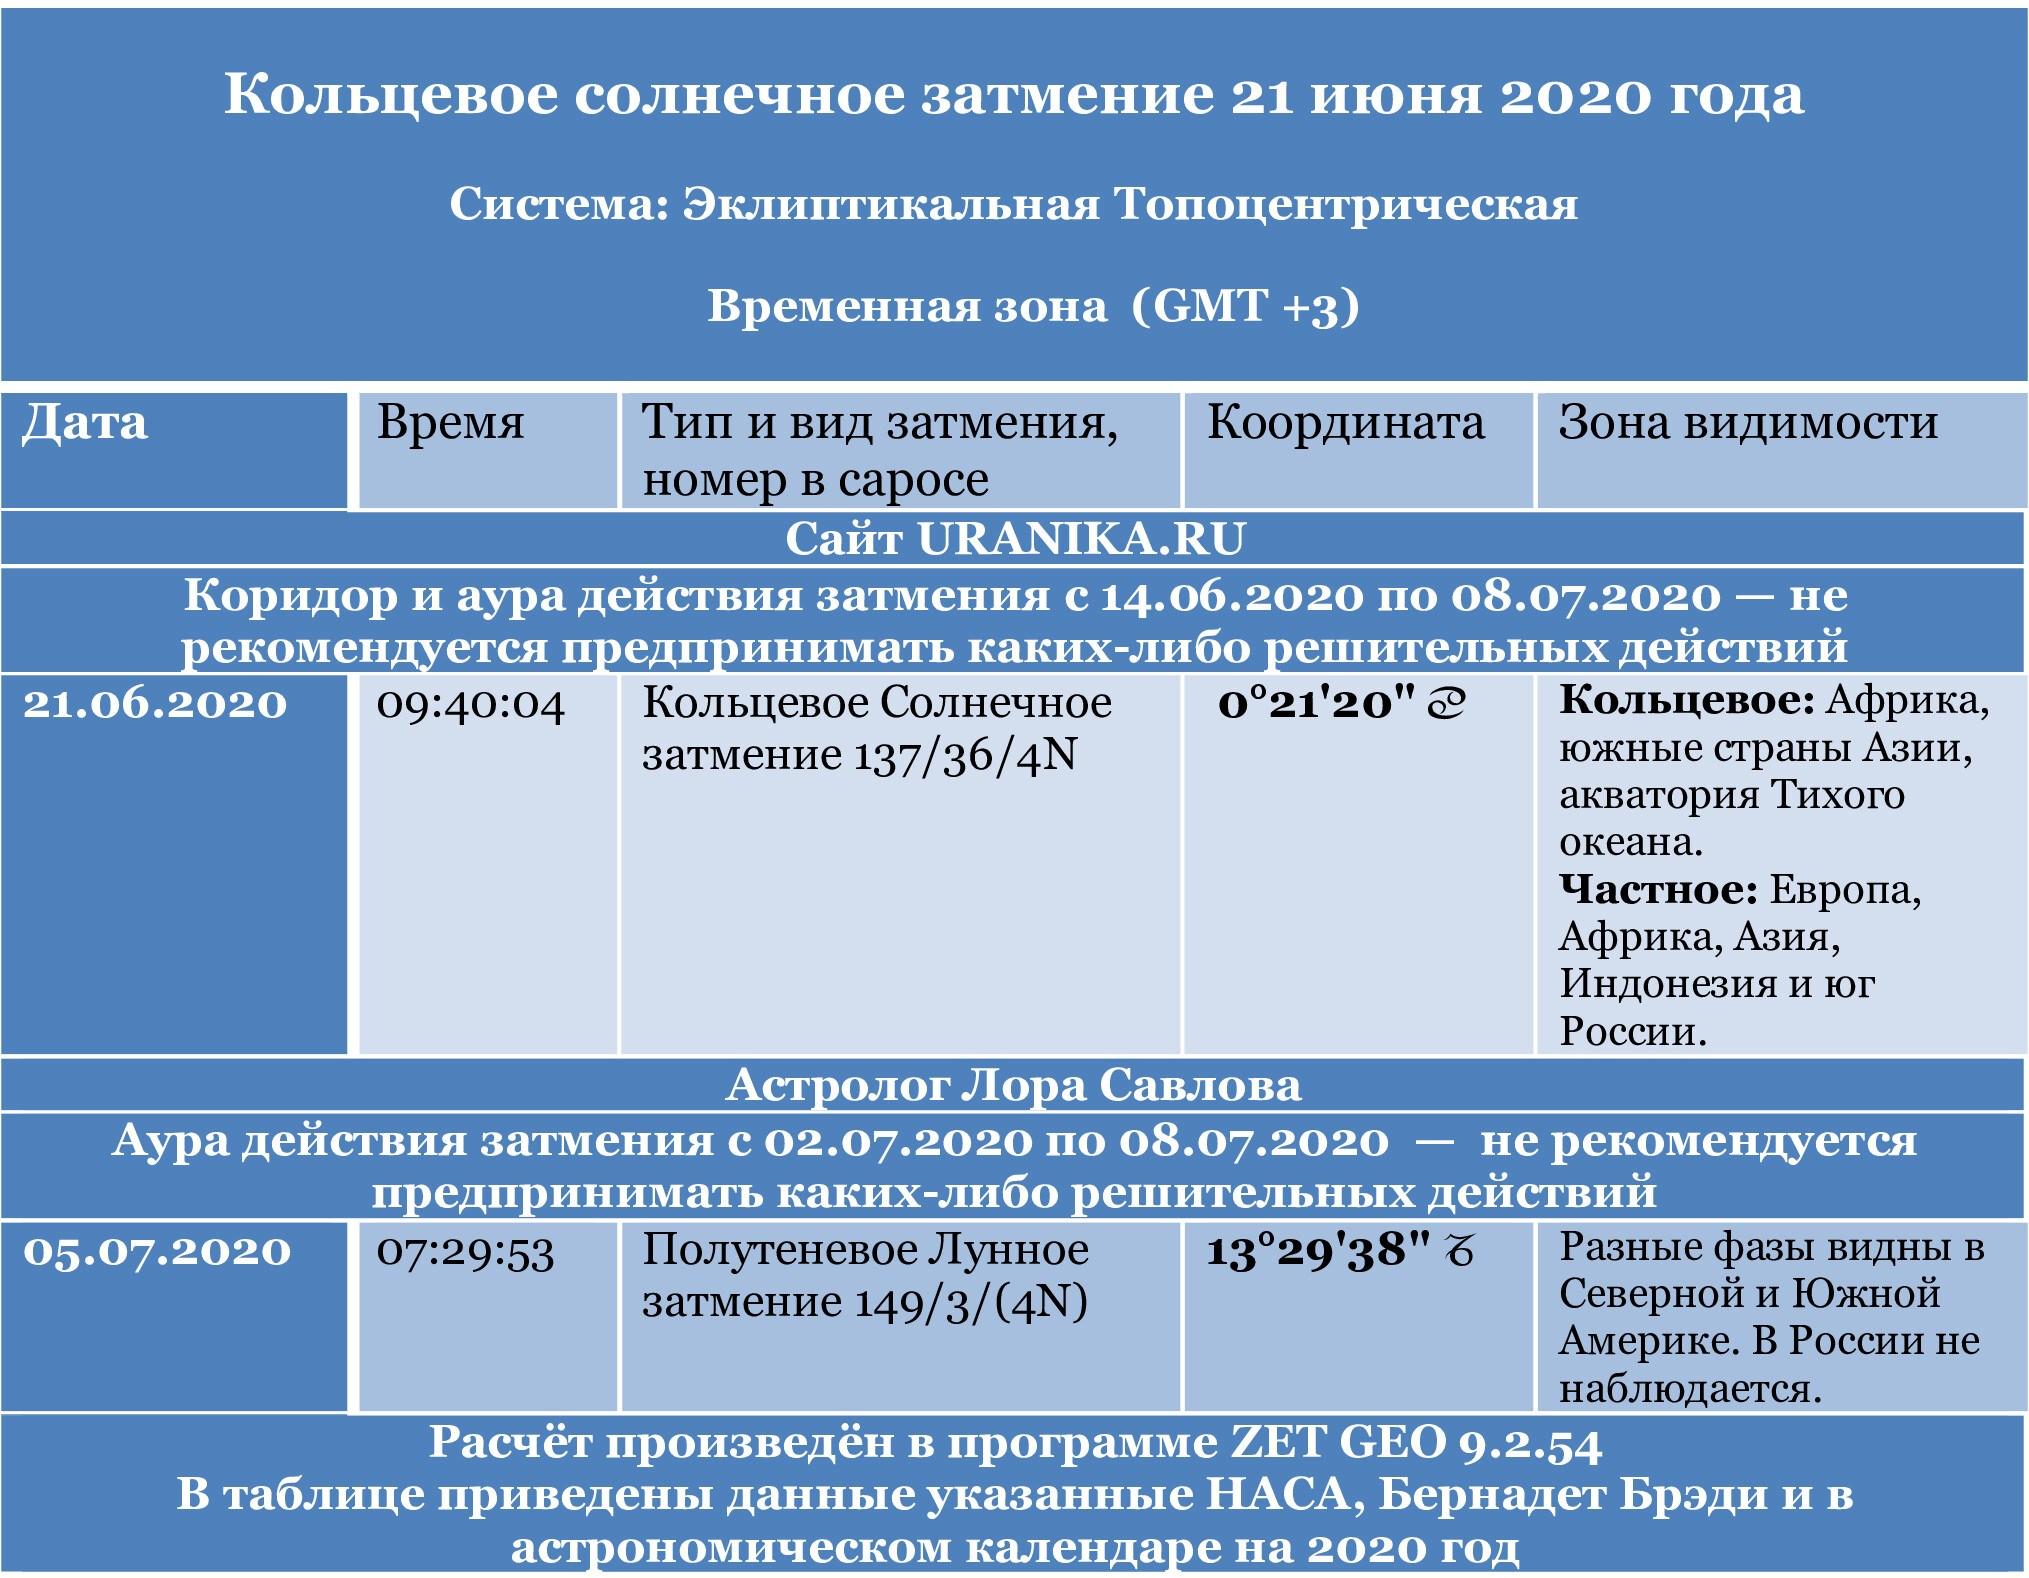 svodnaja tablica po zatmeniju 21 ijunja 2020 goda - Солнечное затмение 21 июня 2020 года